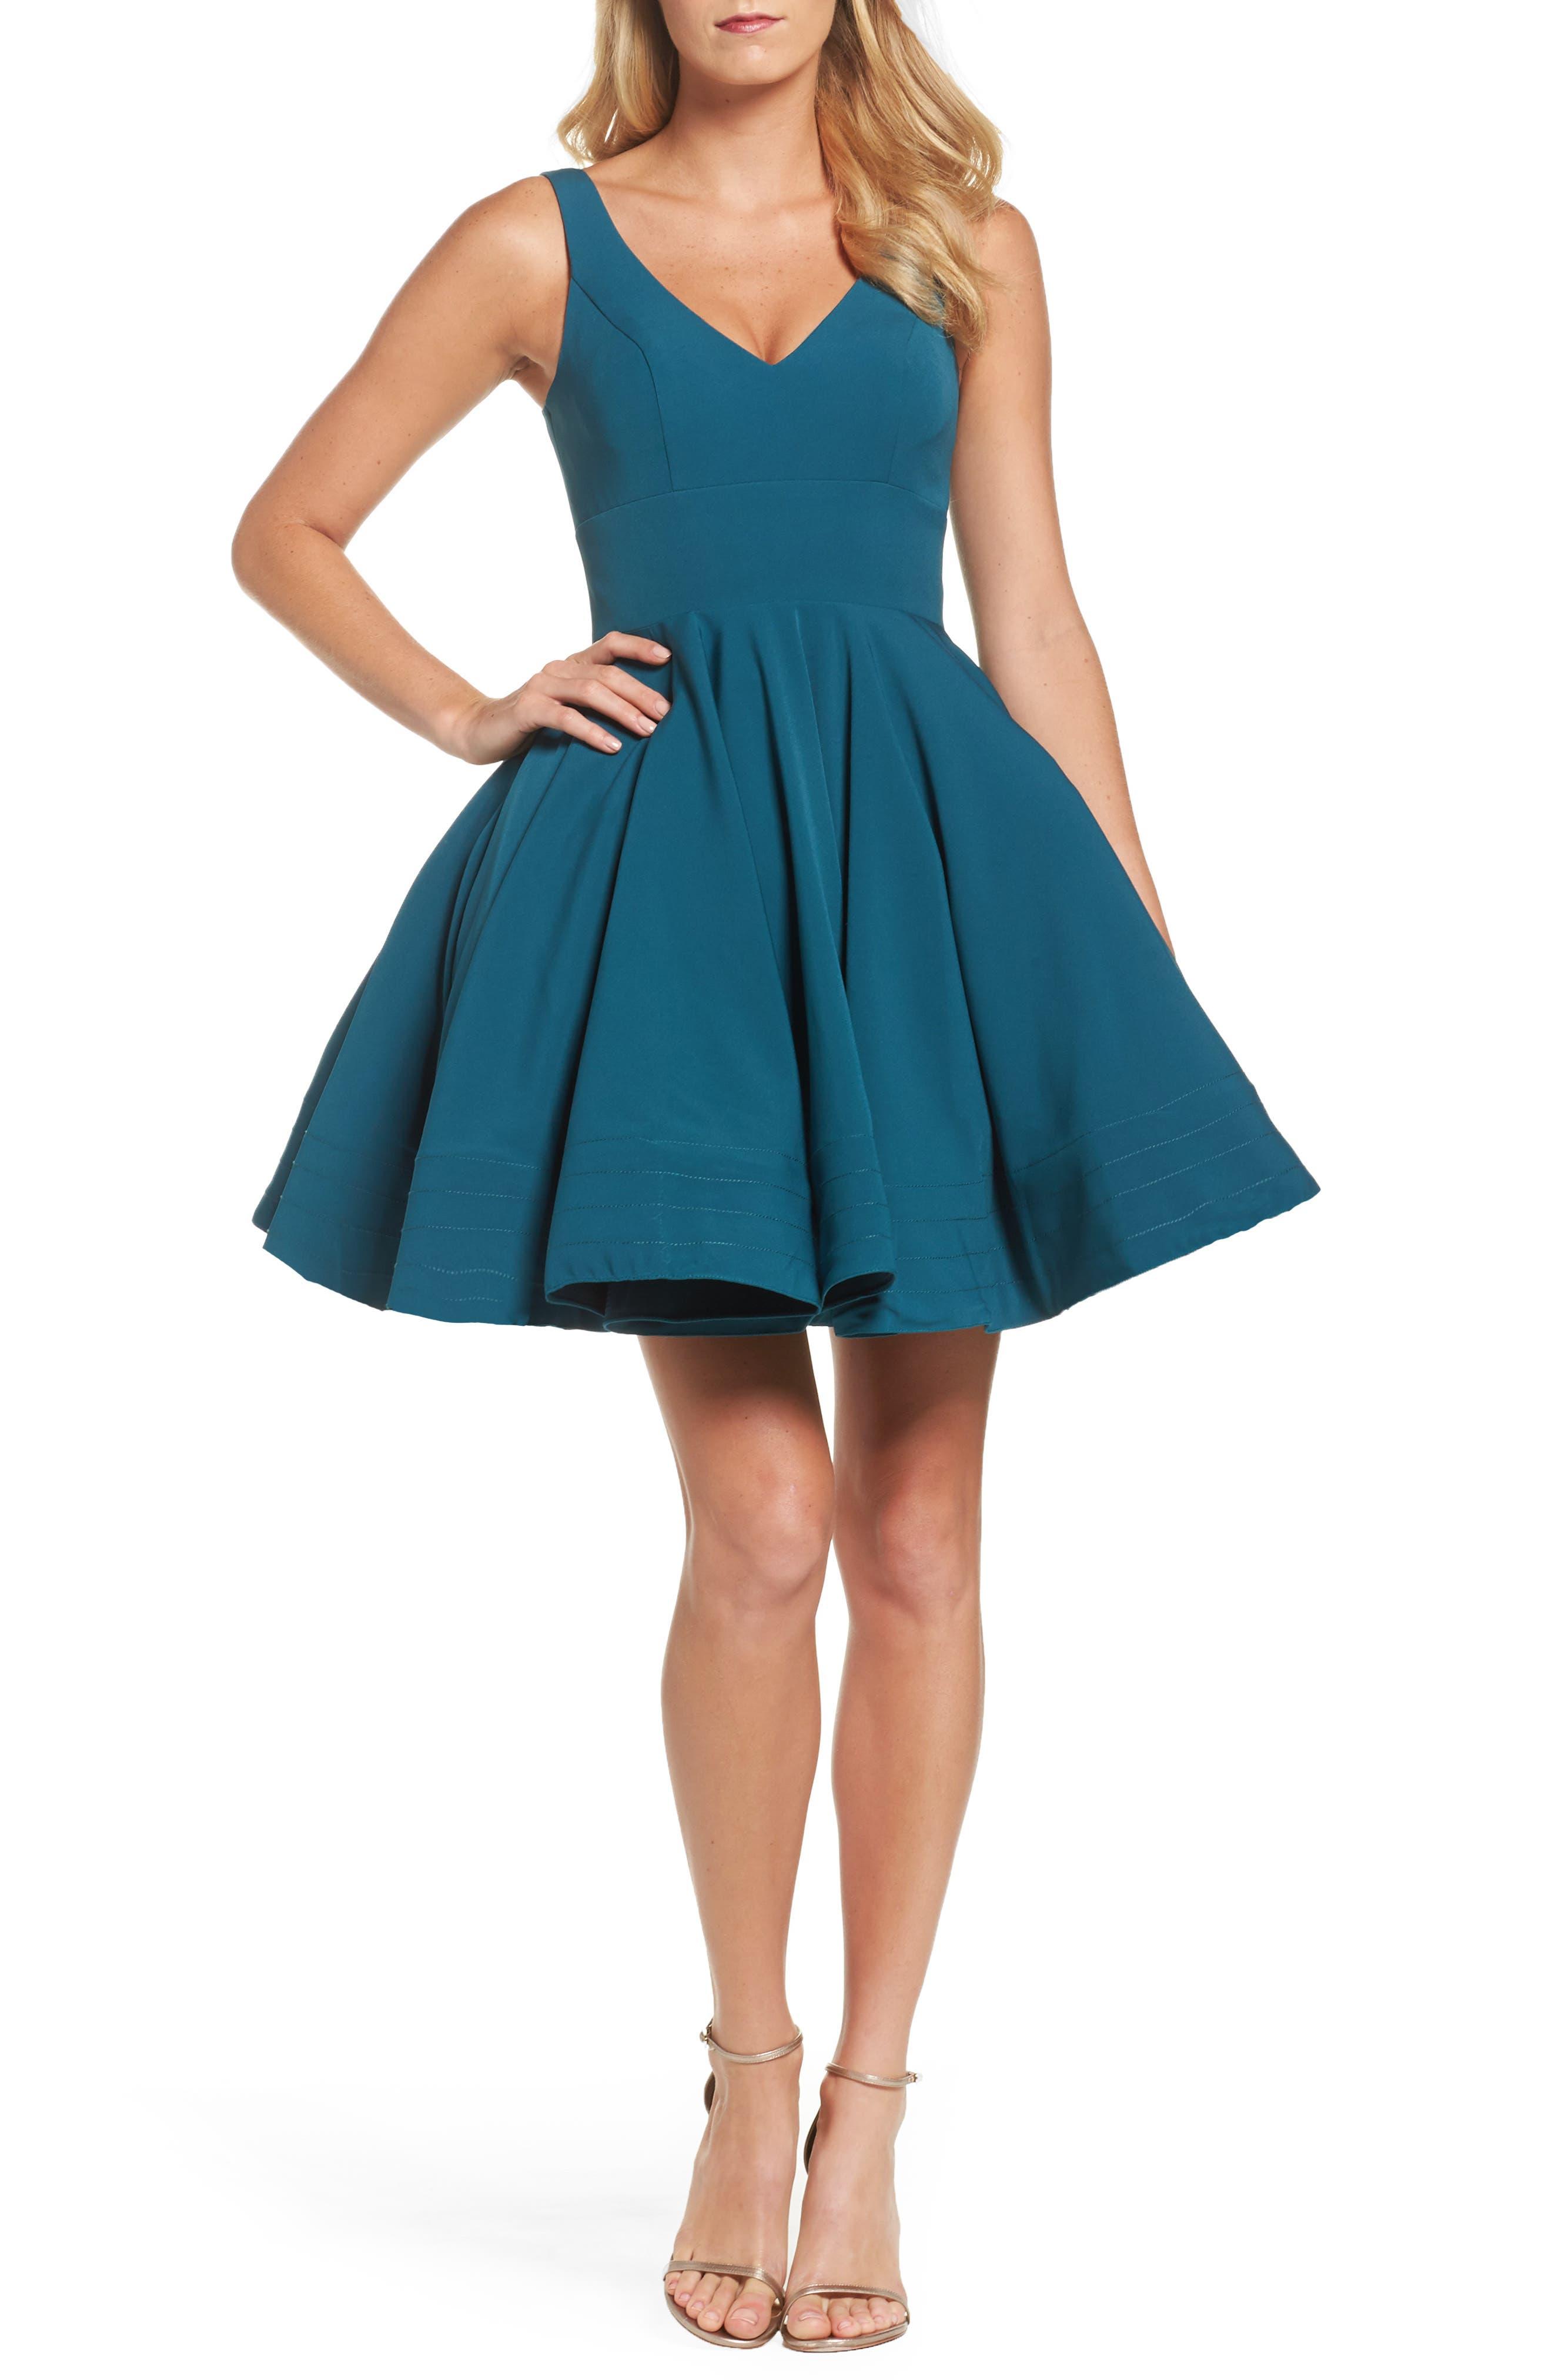 Teal Cocktail Dress